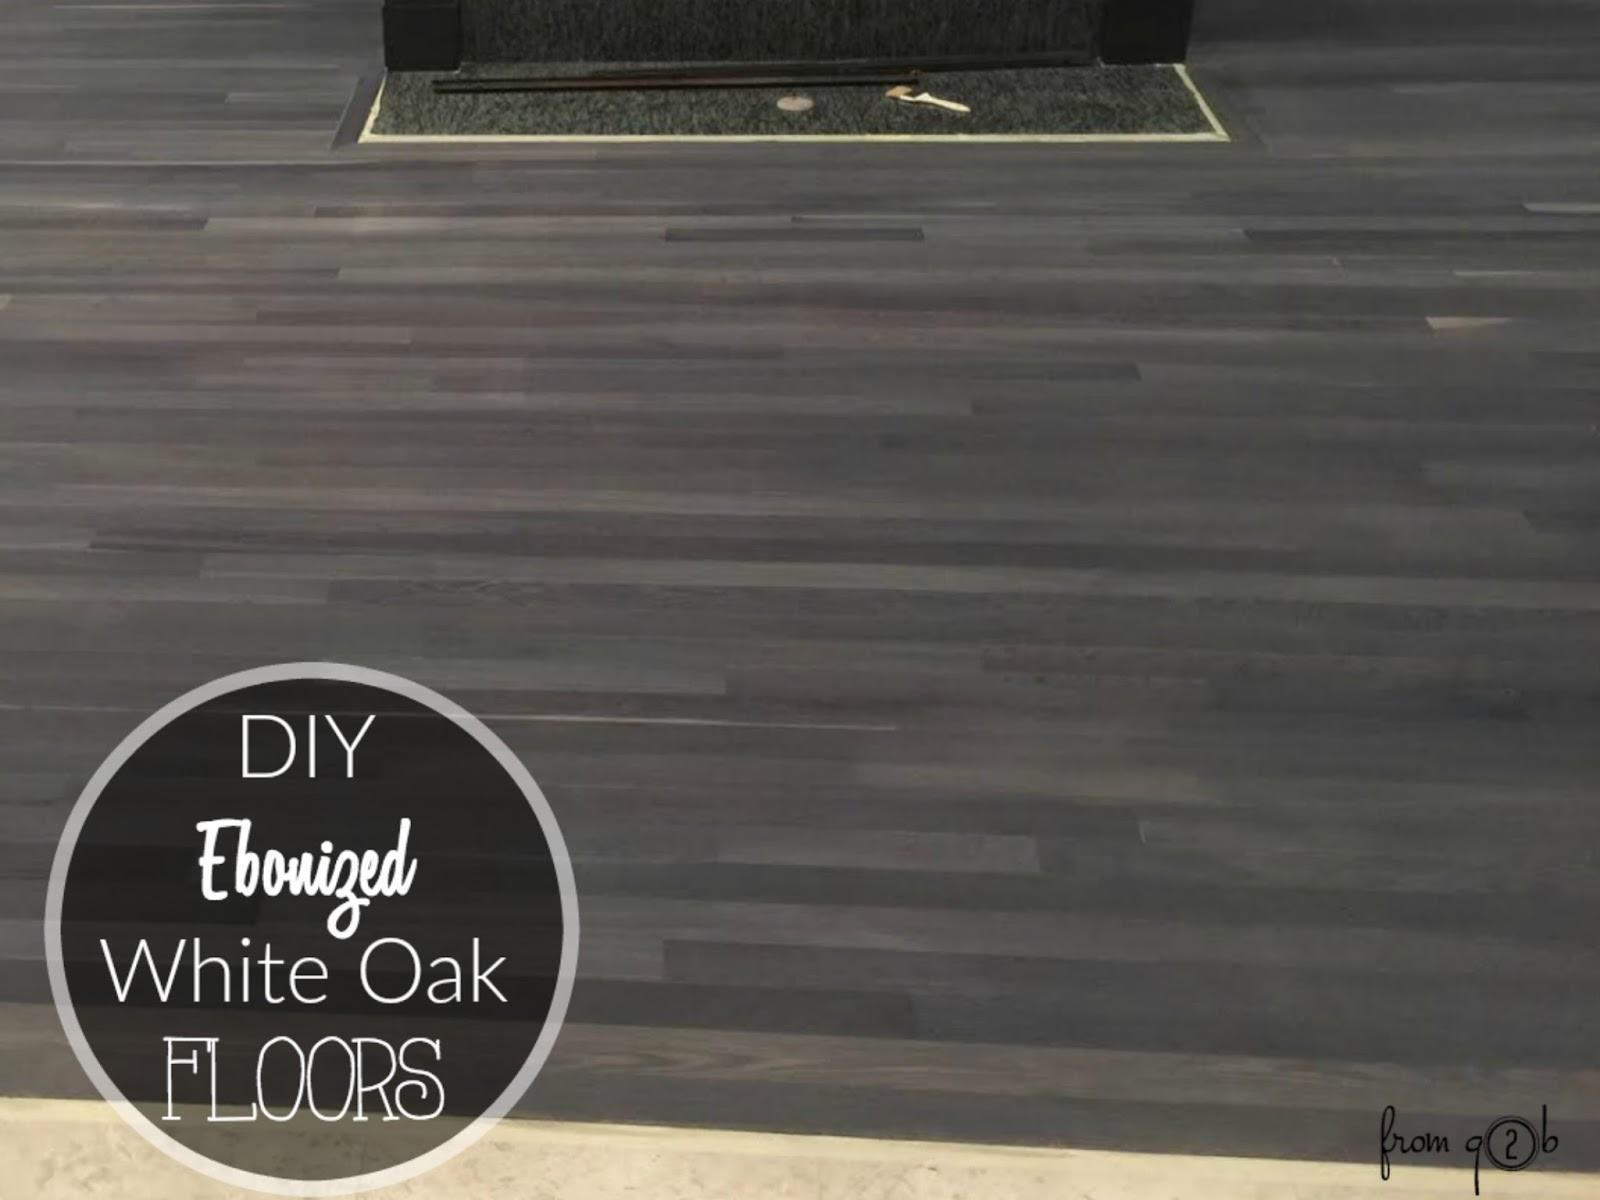 Diy Ebonized White Oak Floors